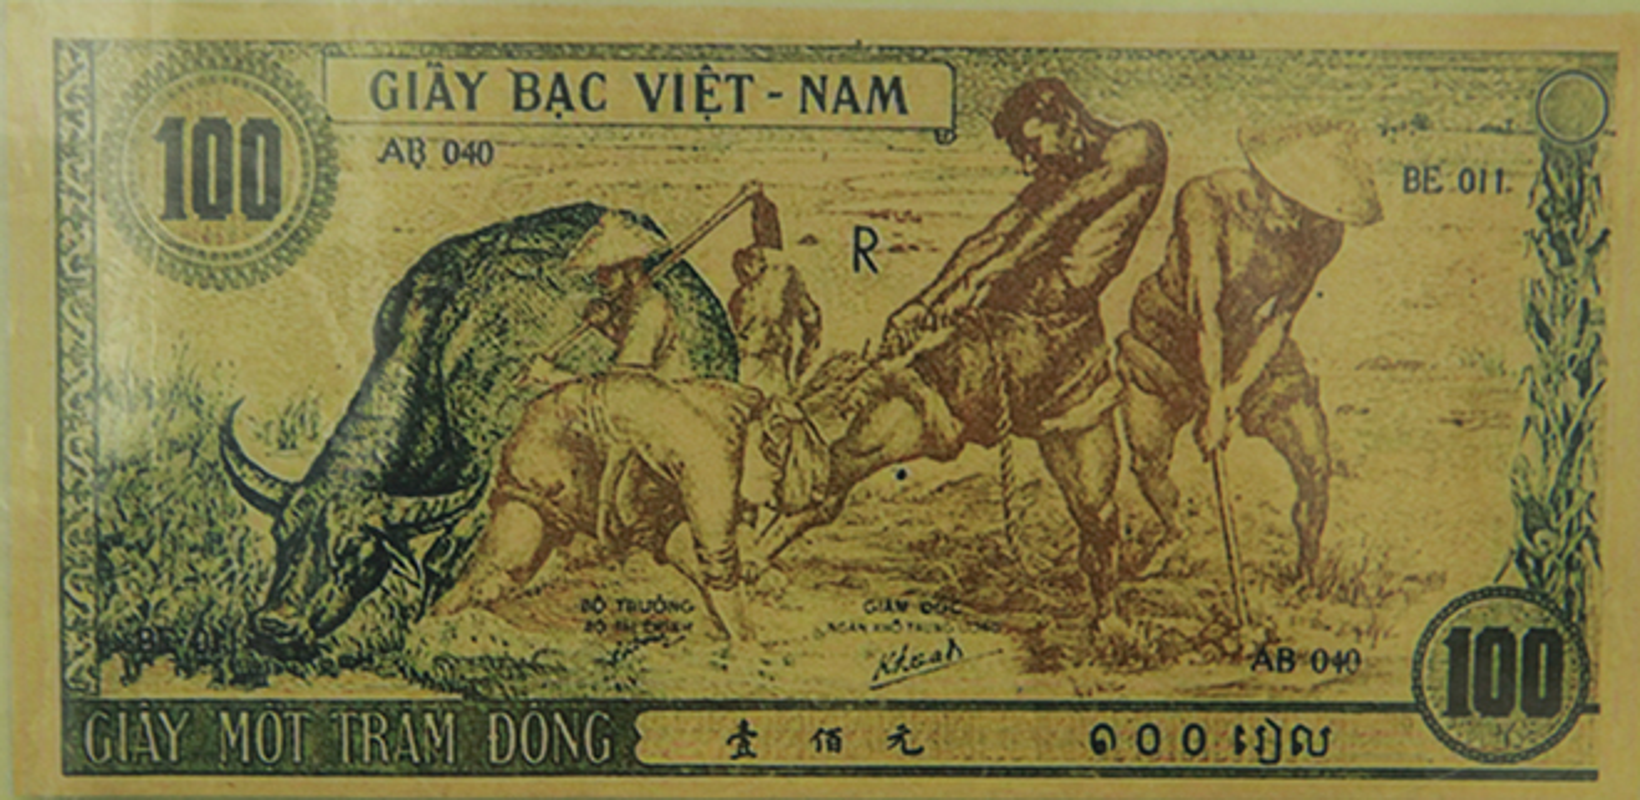 Chuyen it biet ve nha may in tien dau tien cua Viet Nam-Hinh-7